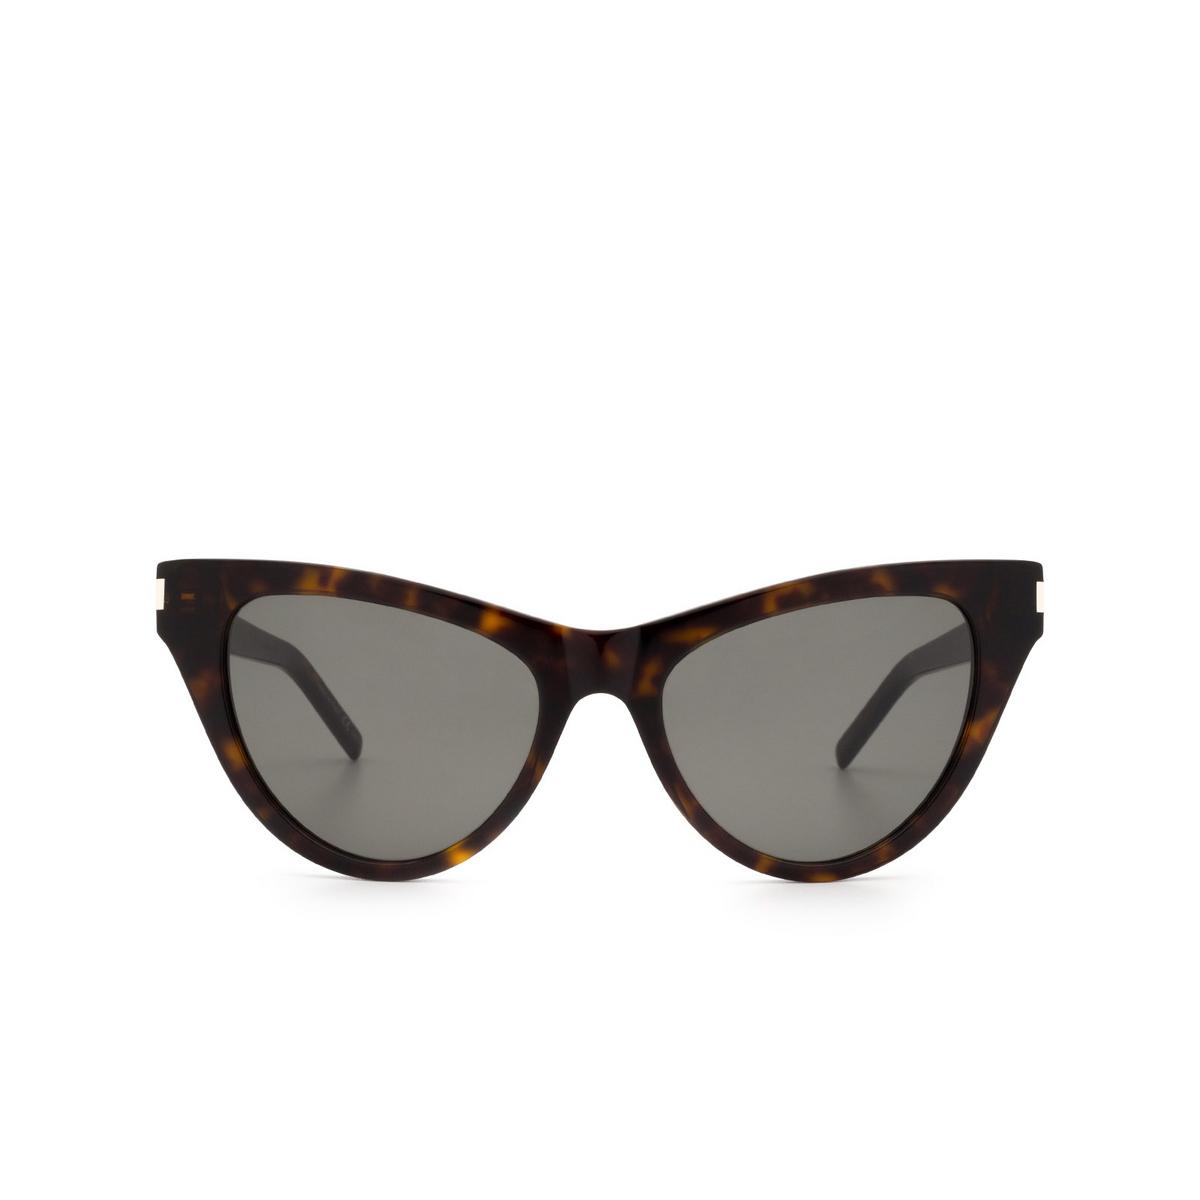 Saint Laurent® Cat-eye Sunglasses: SL 425 color Havana 002 - 1/3.